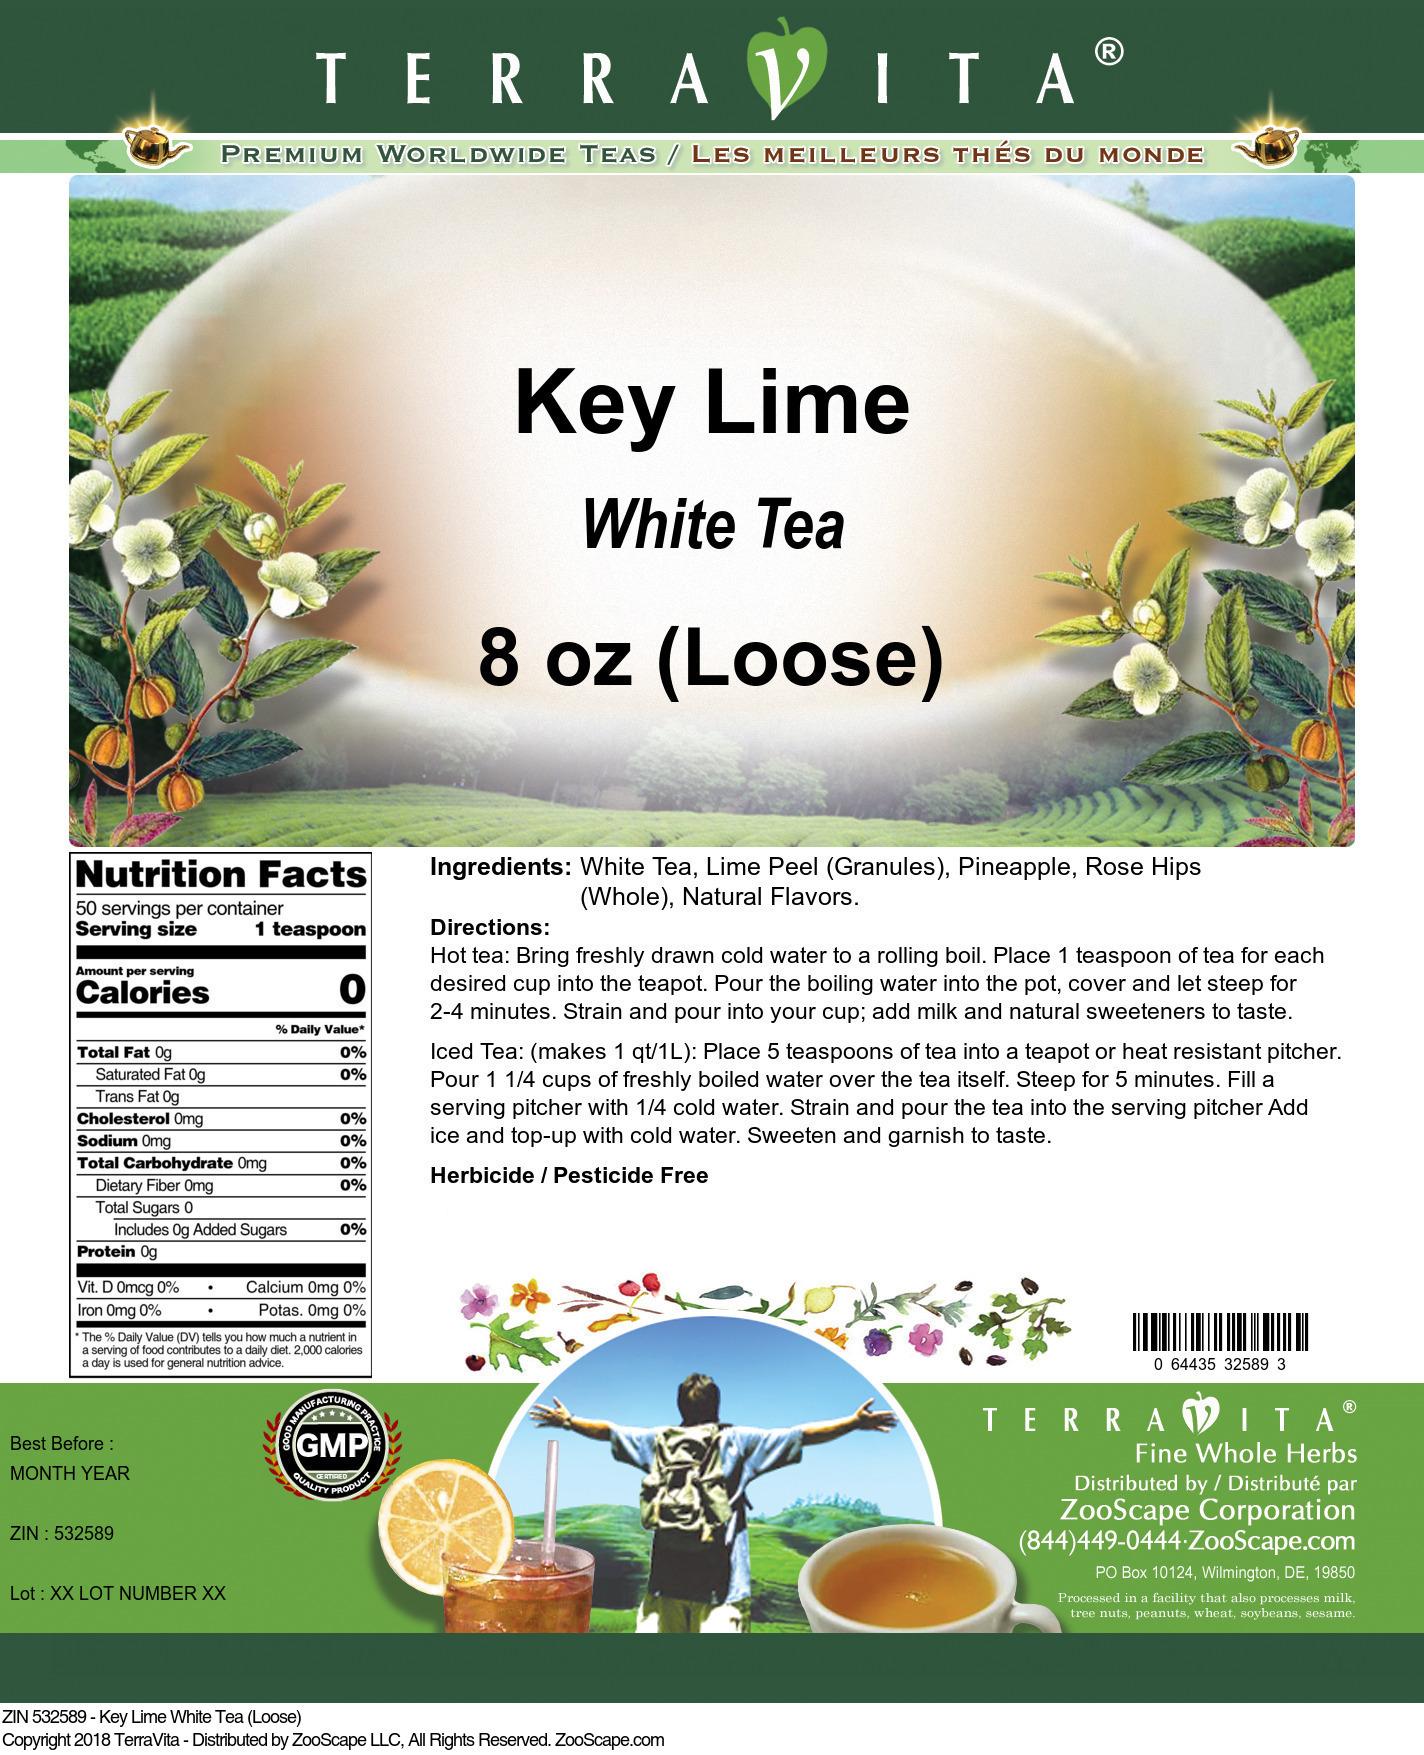 Key Lime White Tea (Loose)